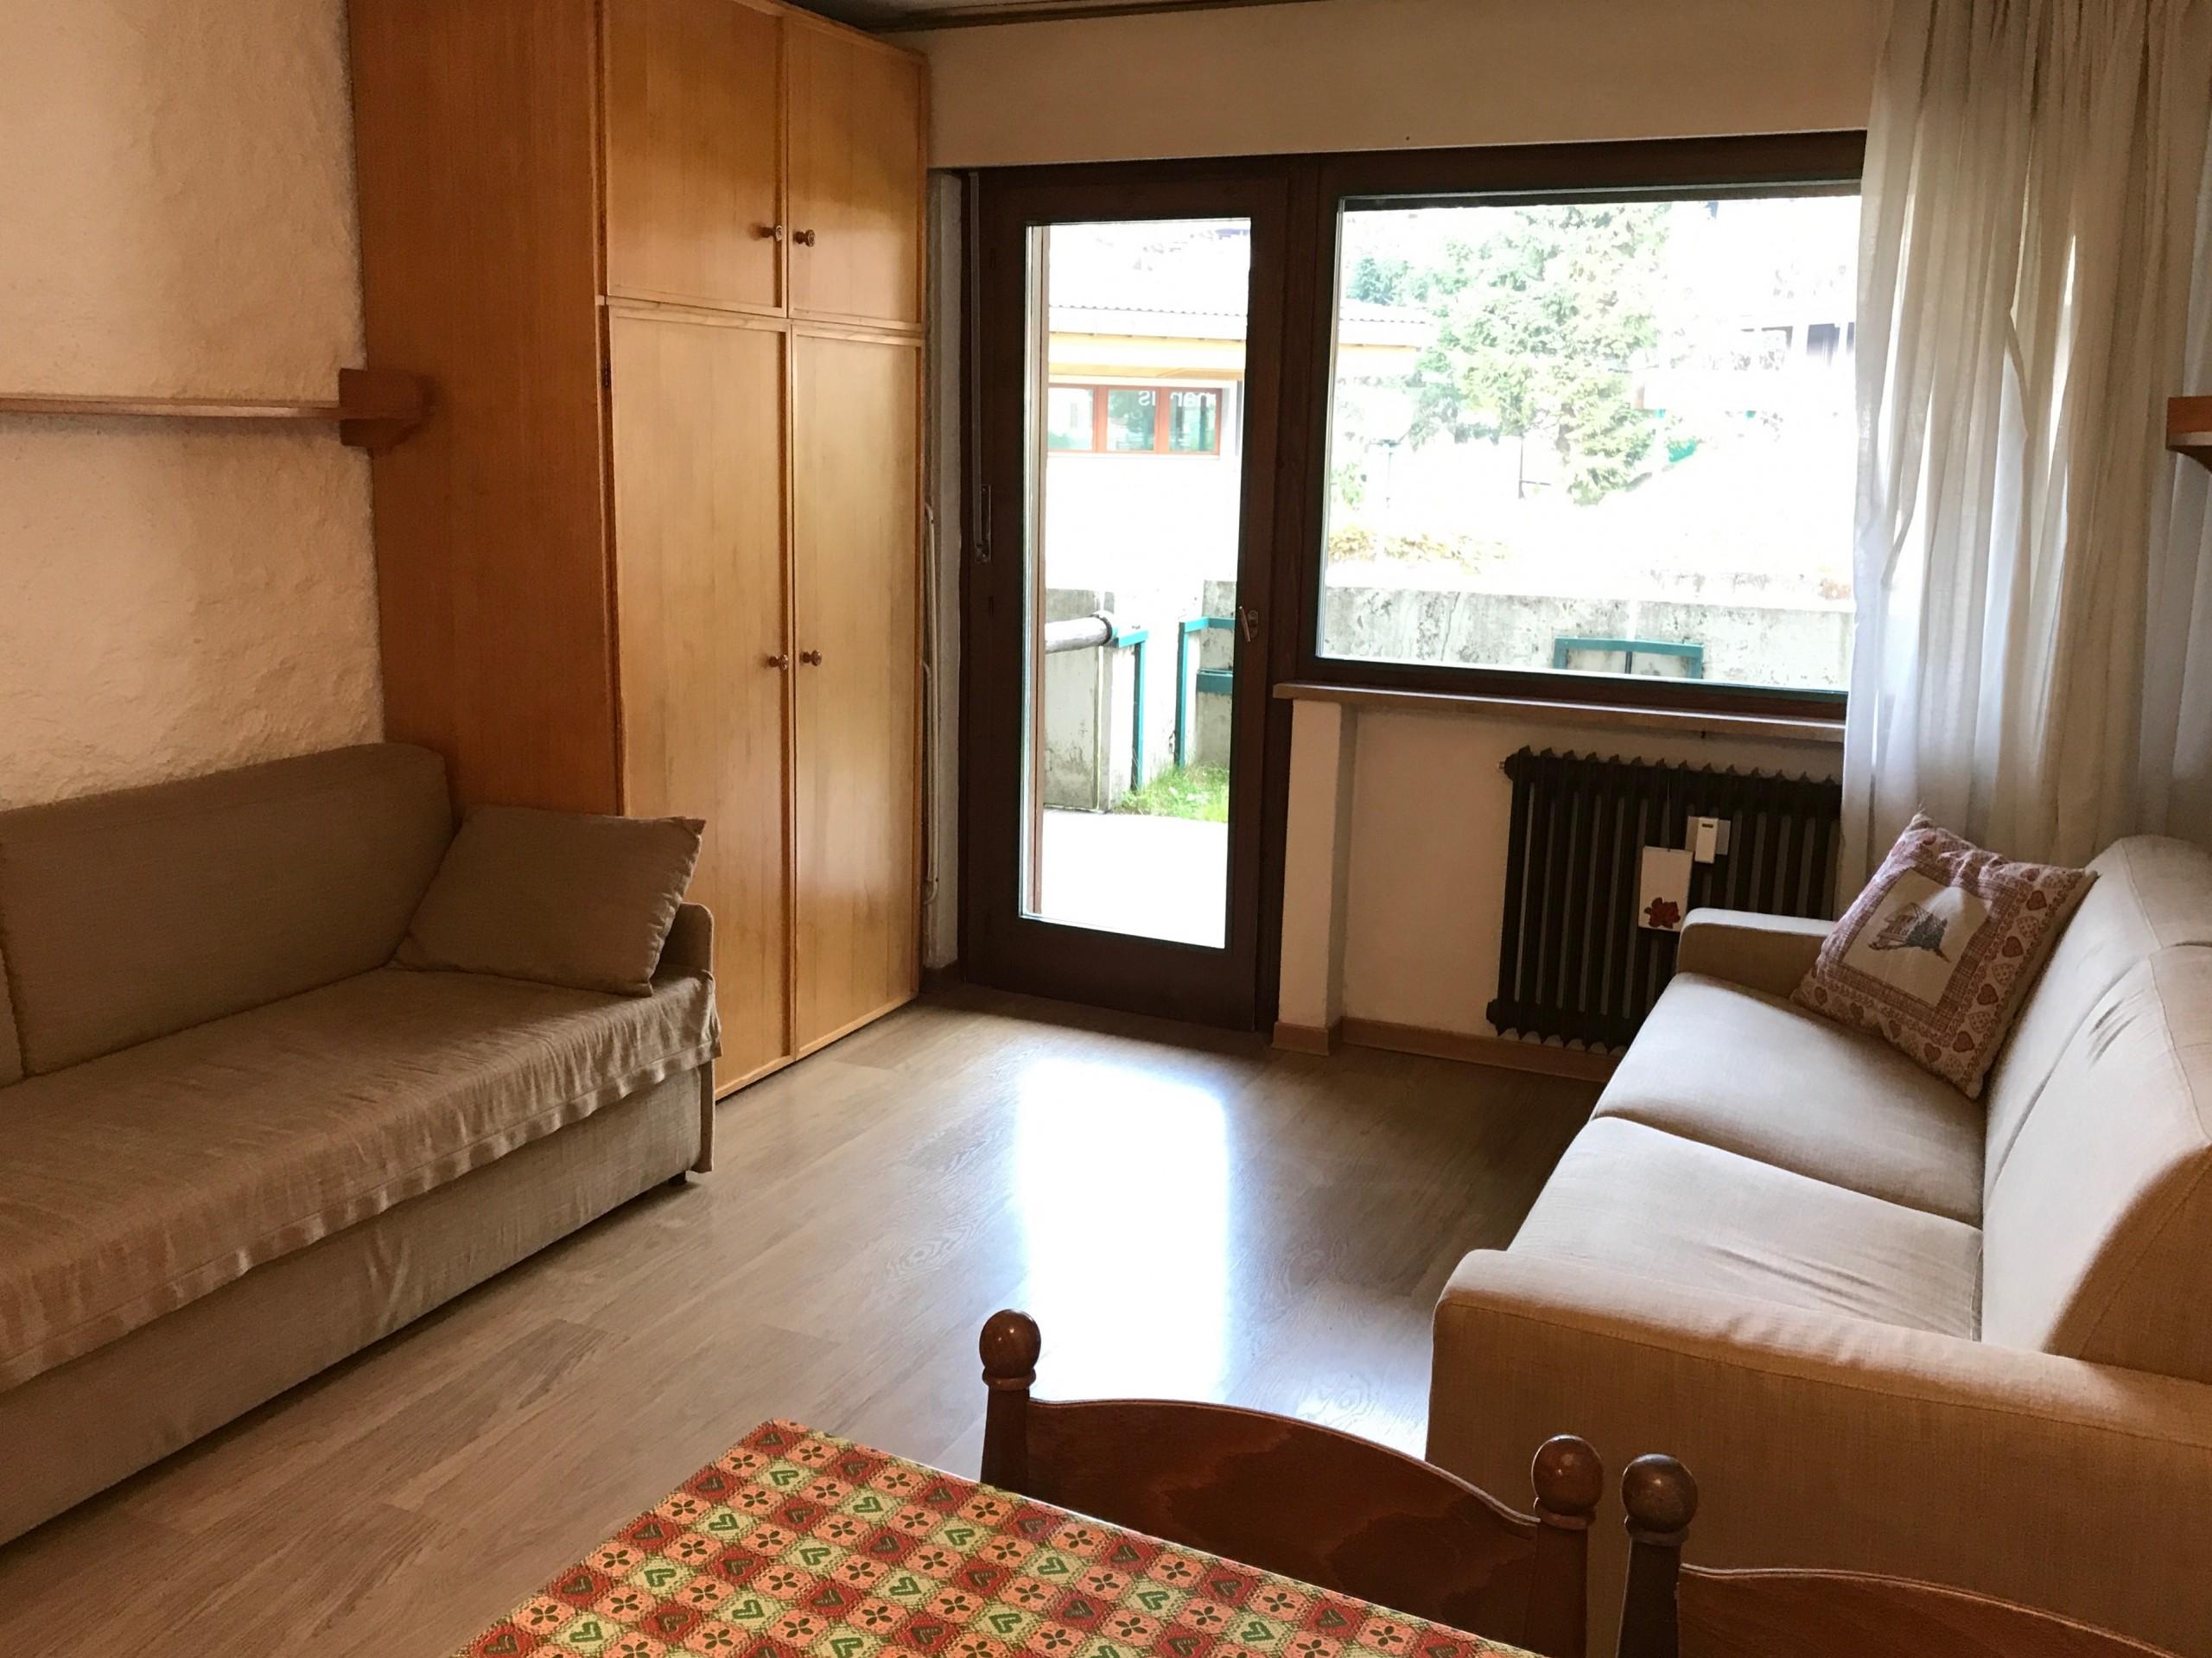 Appartamenti in Madonna di Campiglio - NARDIS 20